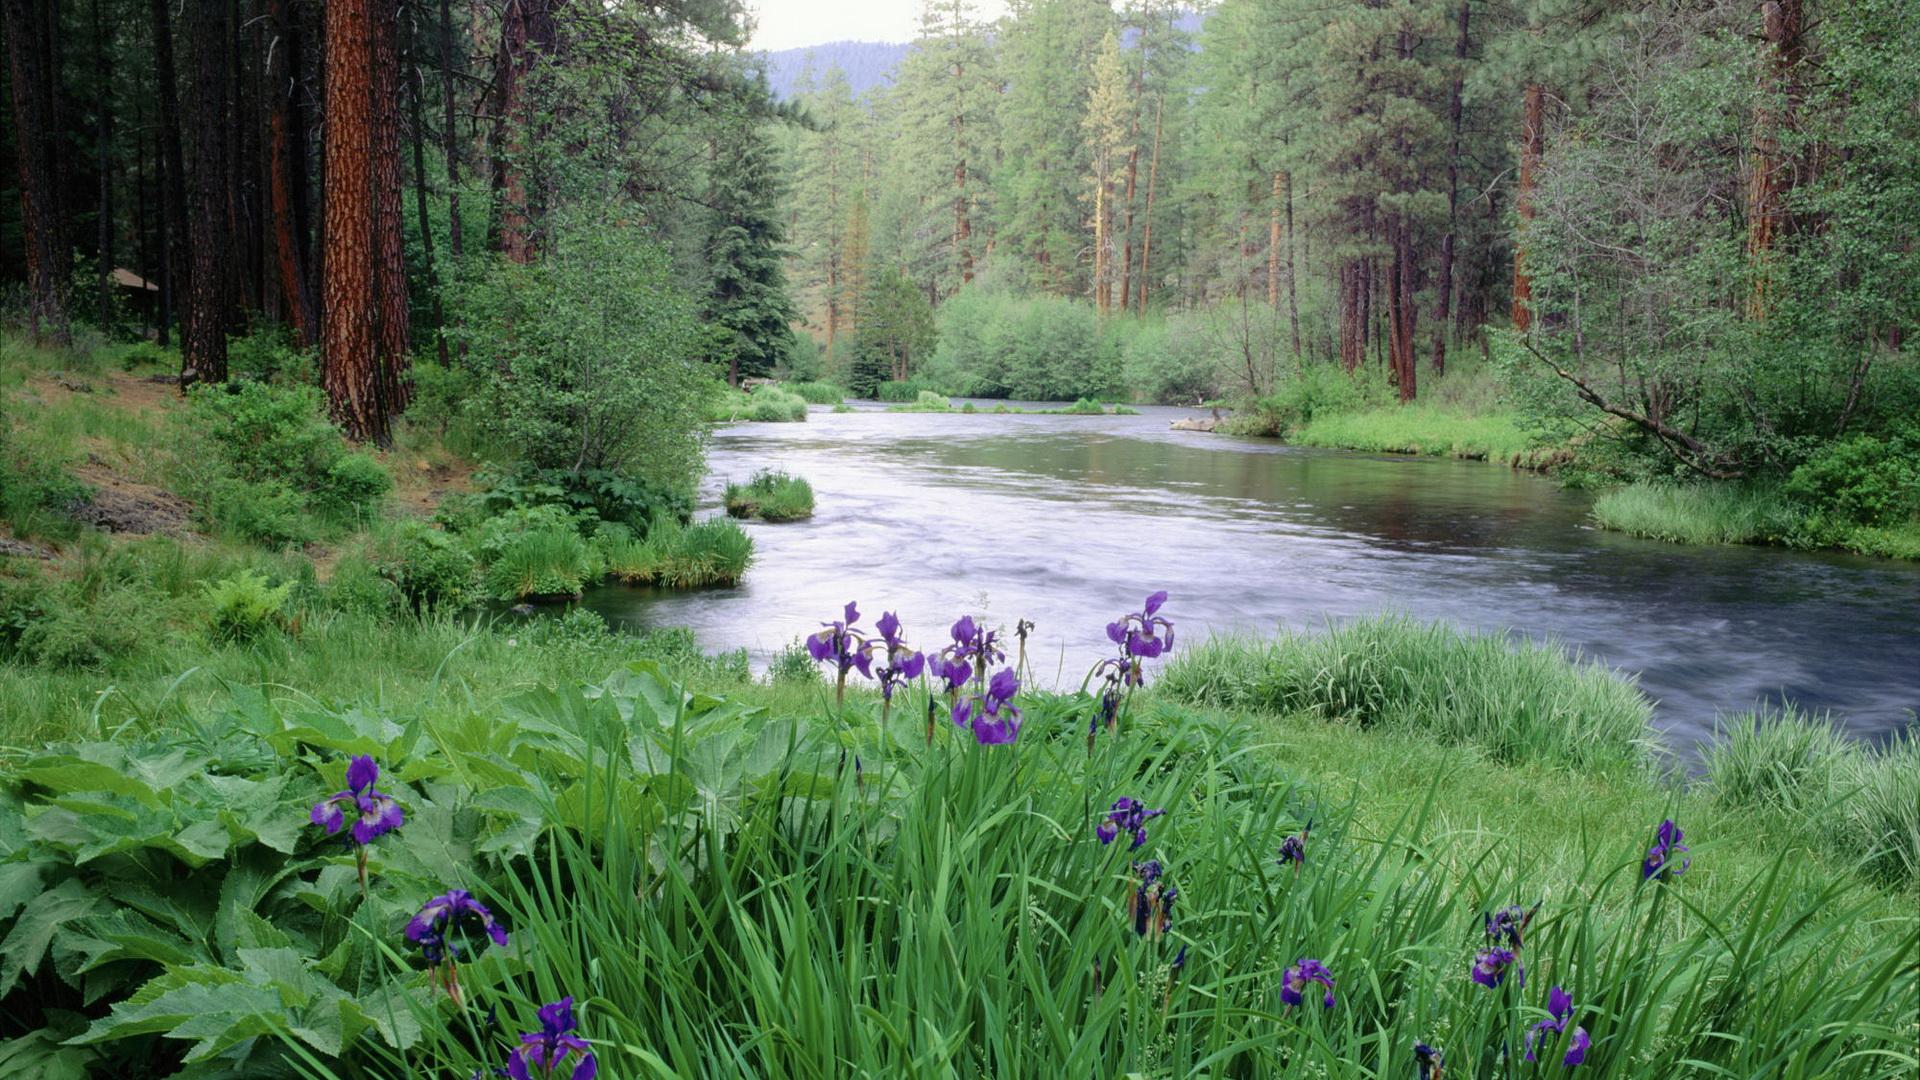 Iris blooms along Metolius River in spring. Deschutes National Forest. Oregon. USA